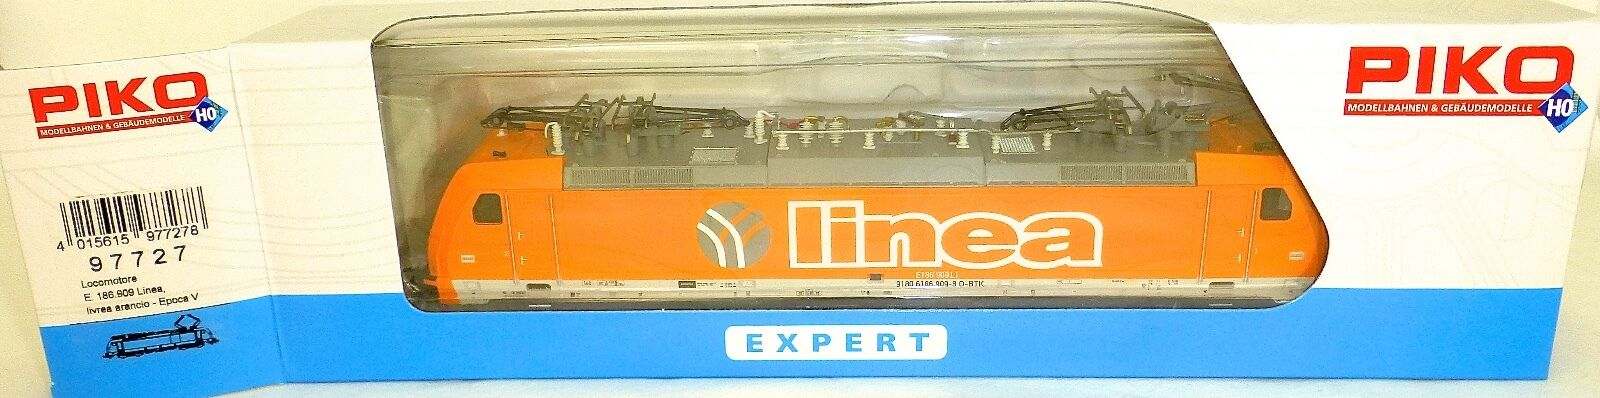 186.909 Linea orange EpV DSS PIKO 97727 H0 1 87 neuf et emballé micro HU4